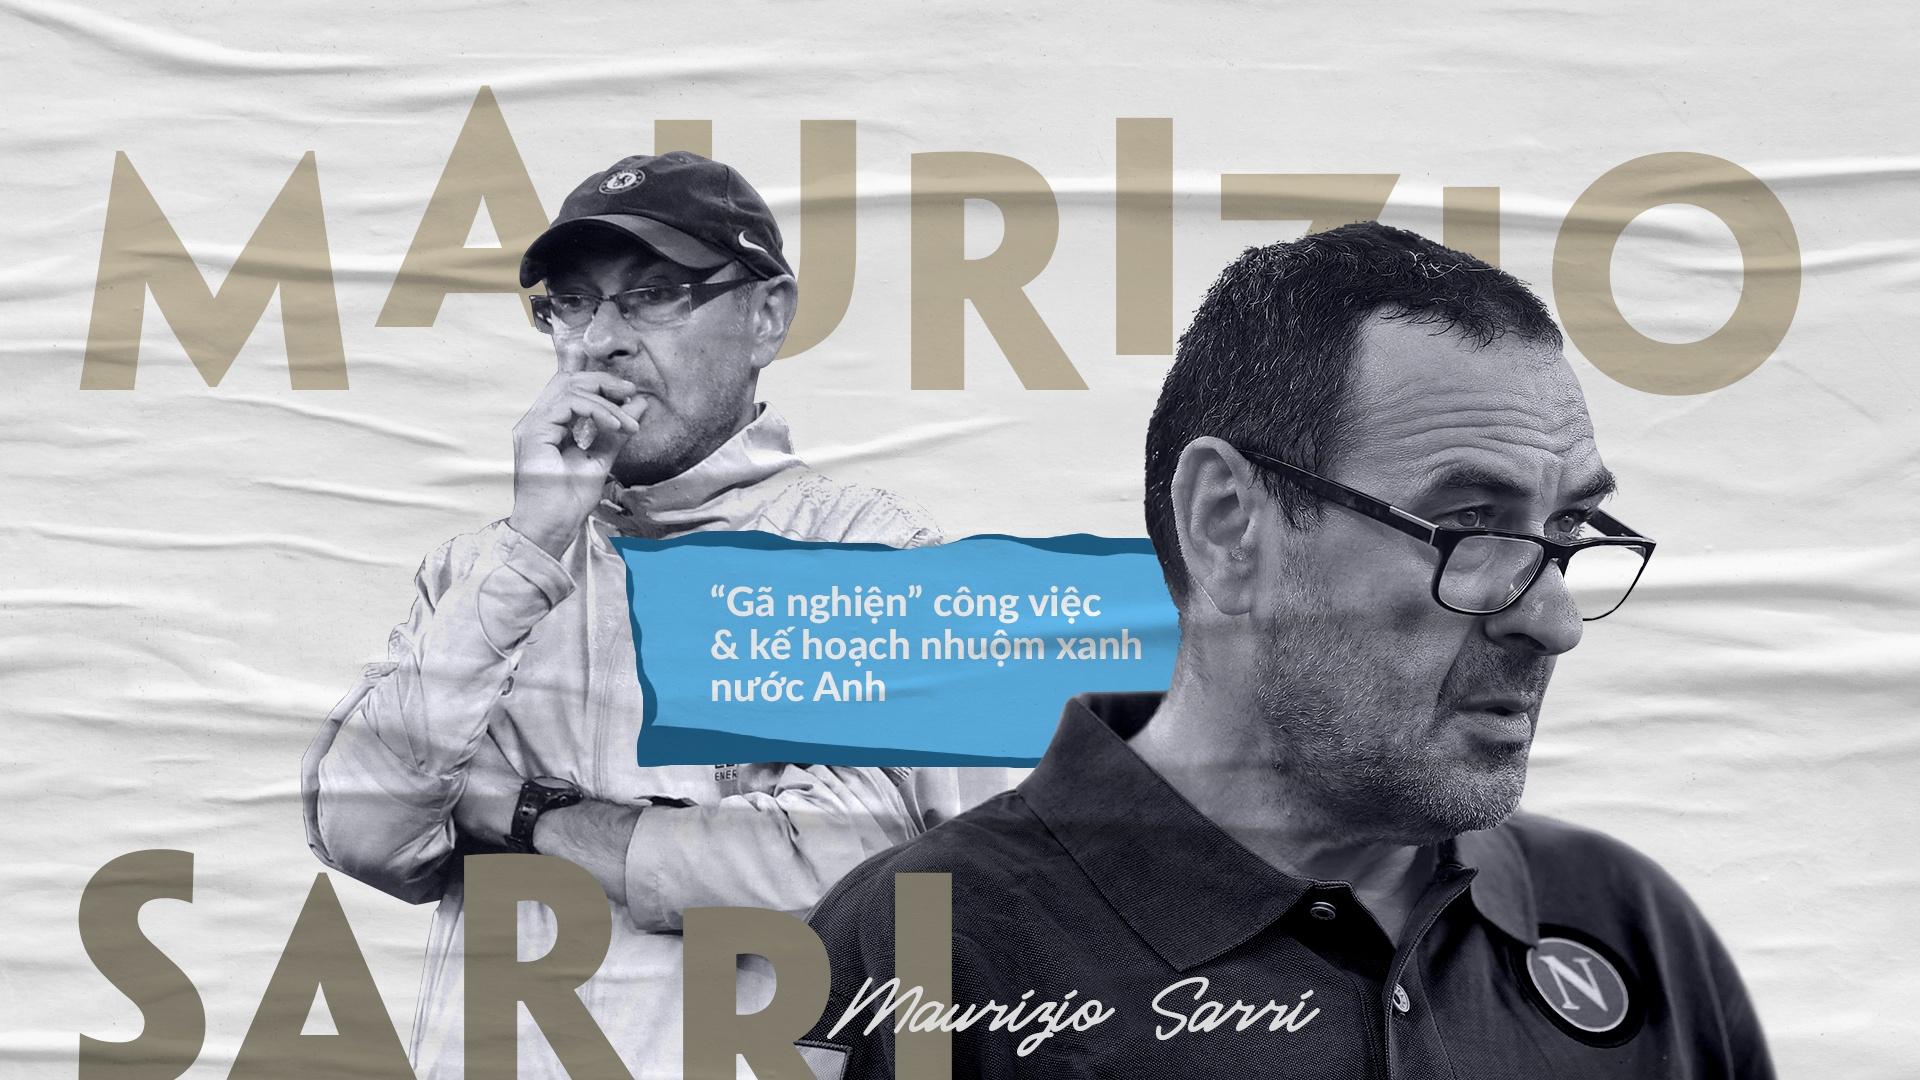 Maurizio Sarri - 'ga nghien' cong viec va ke hoach nhuom xanh nuoc Anh hinh anh 2